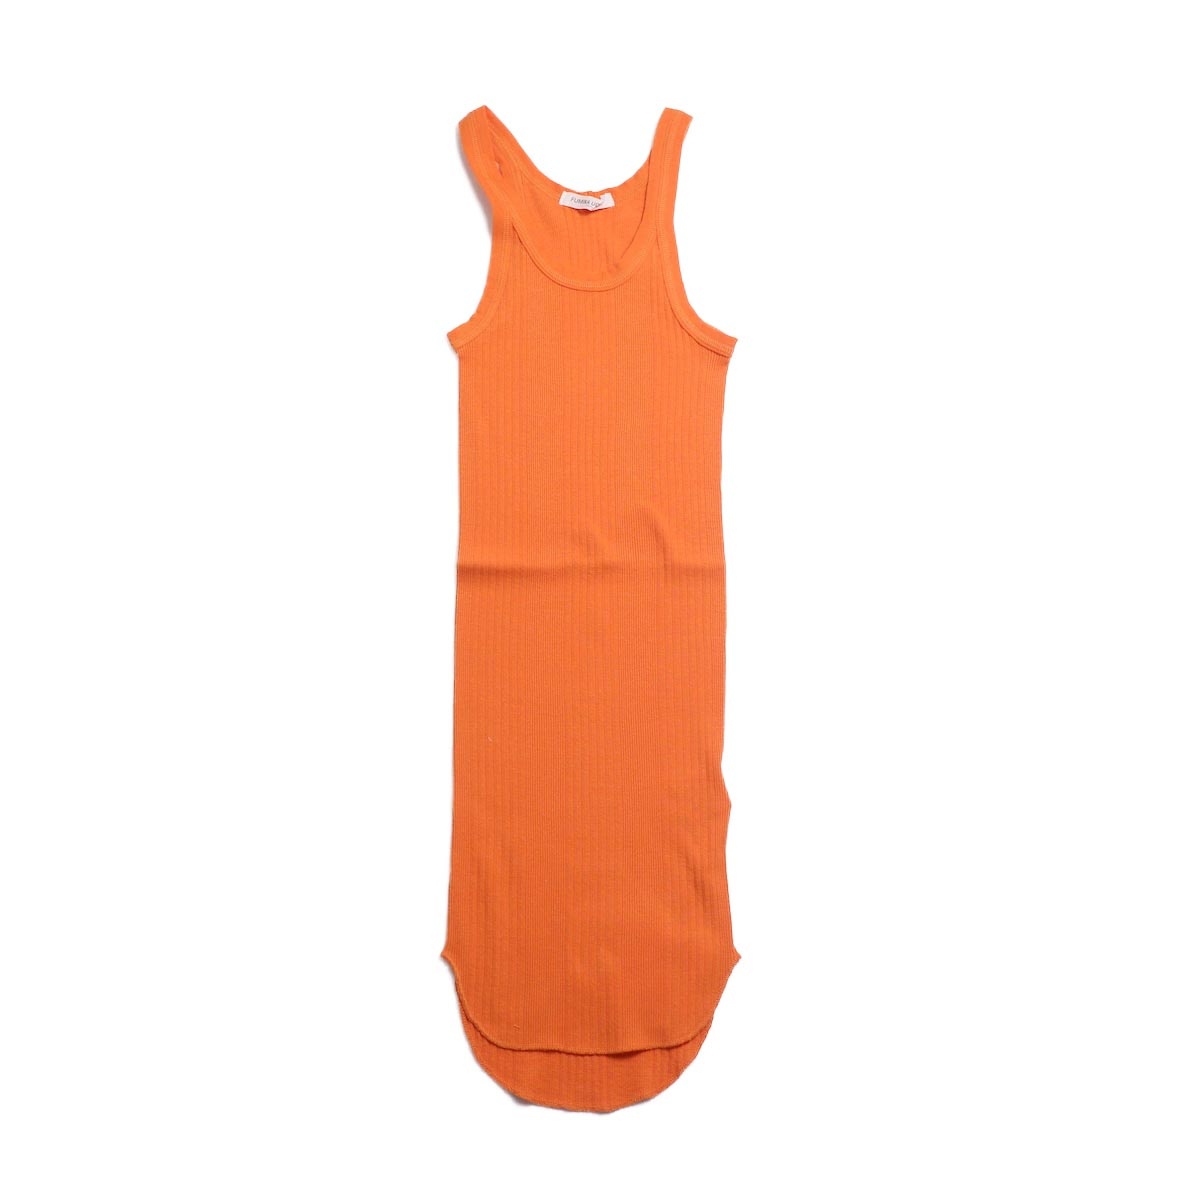 FUMIKA UCHIDA / Cotton Needle Drawing Tank Top -Orange